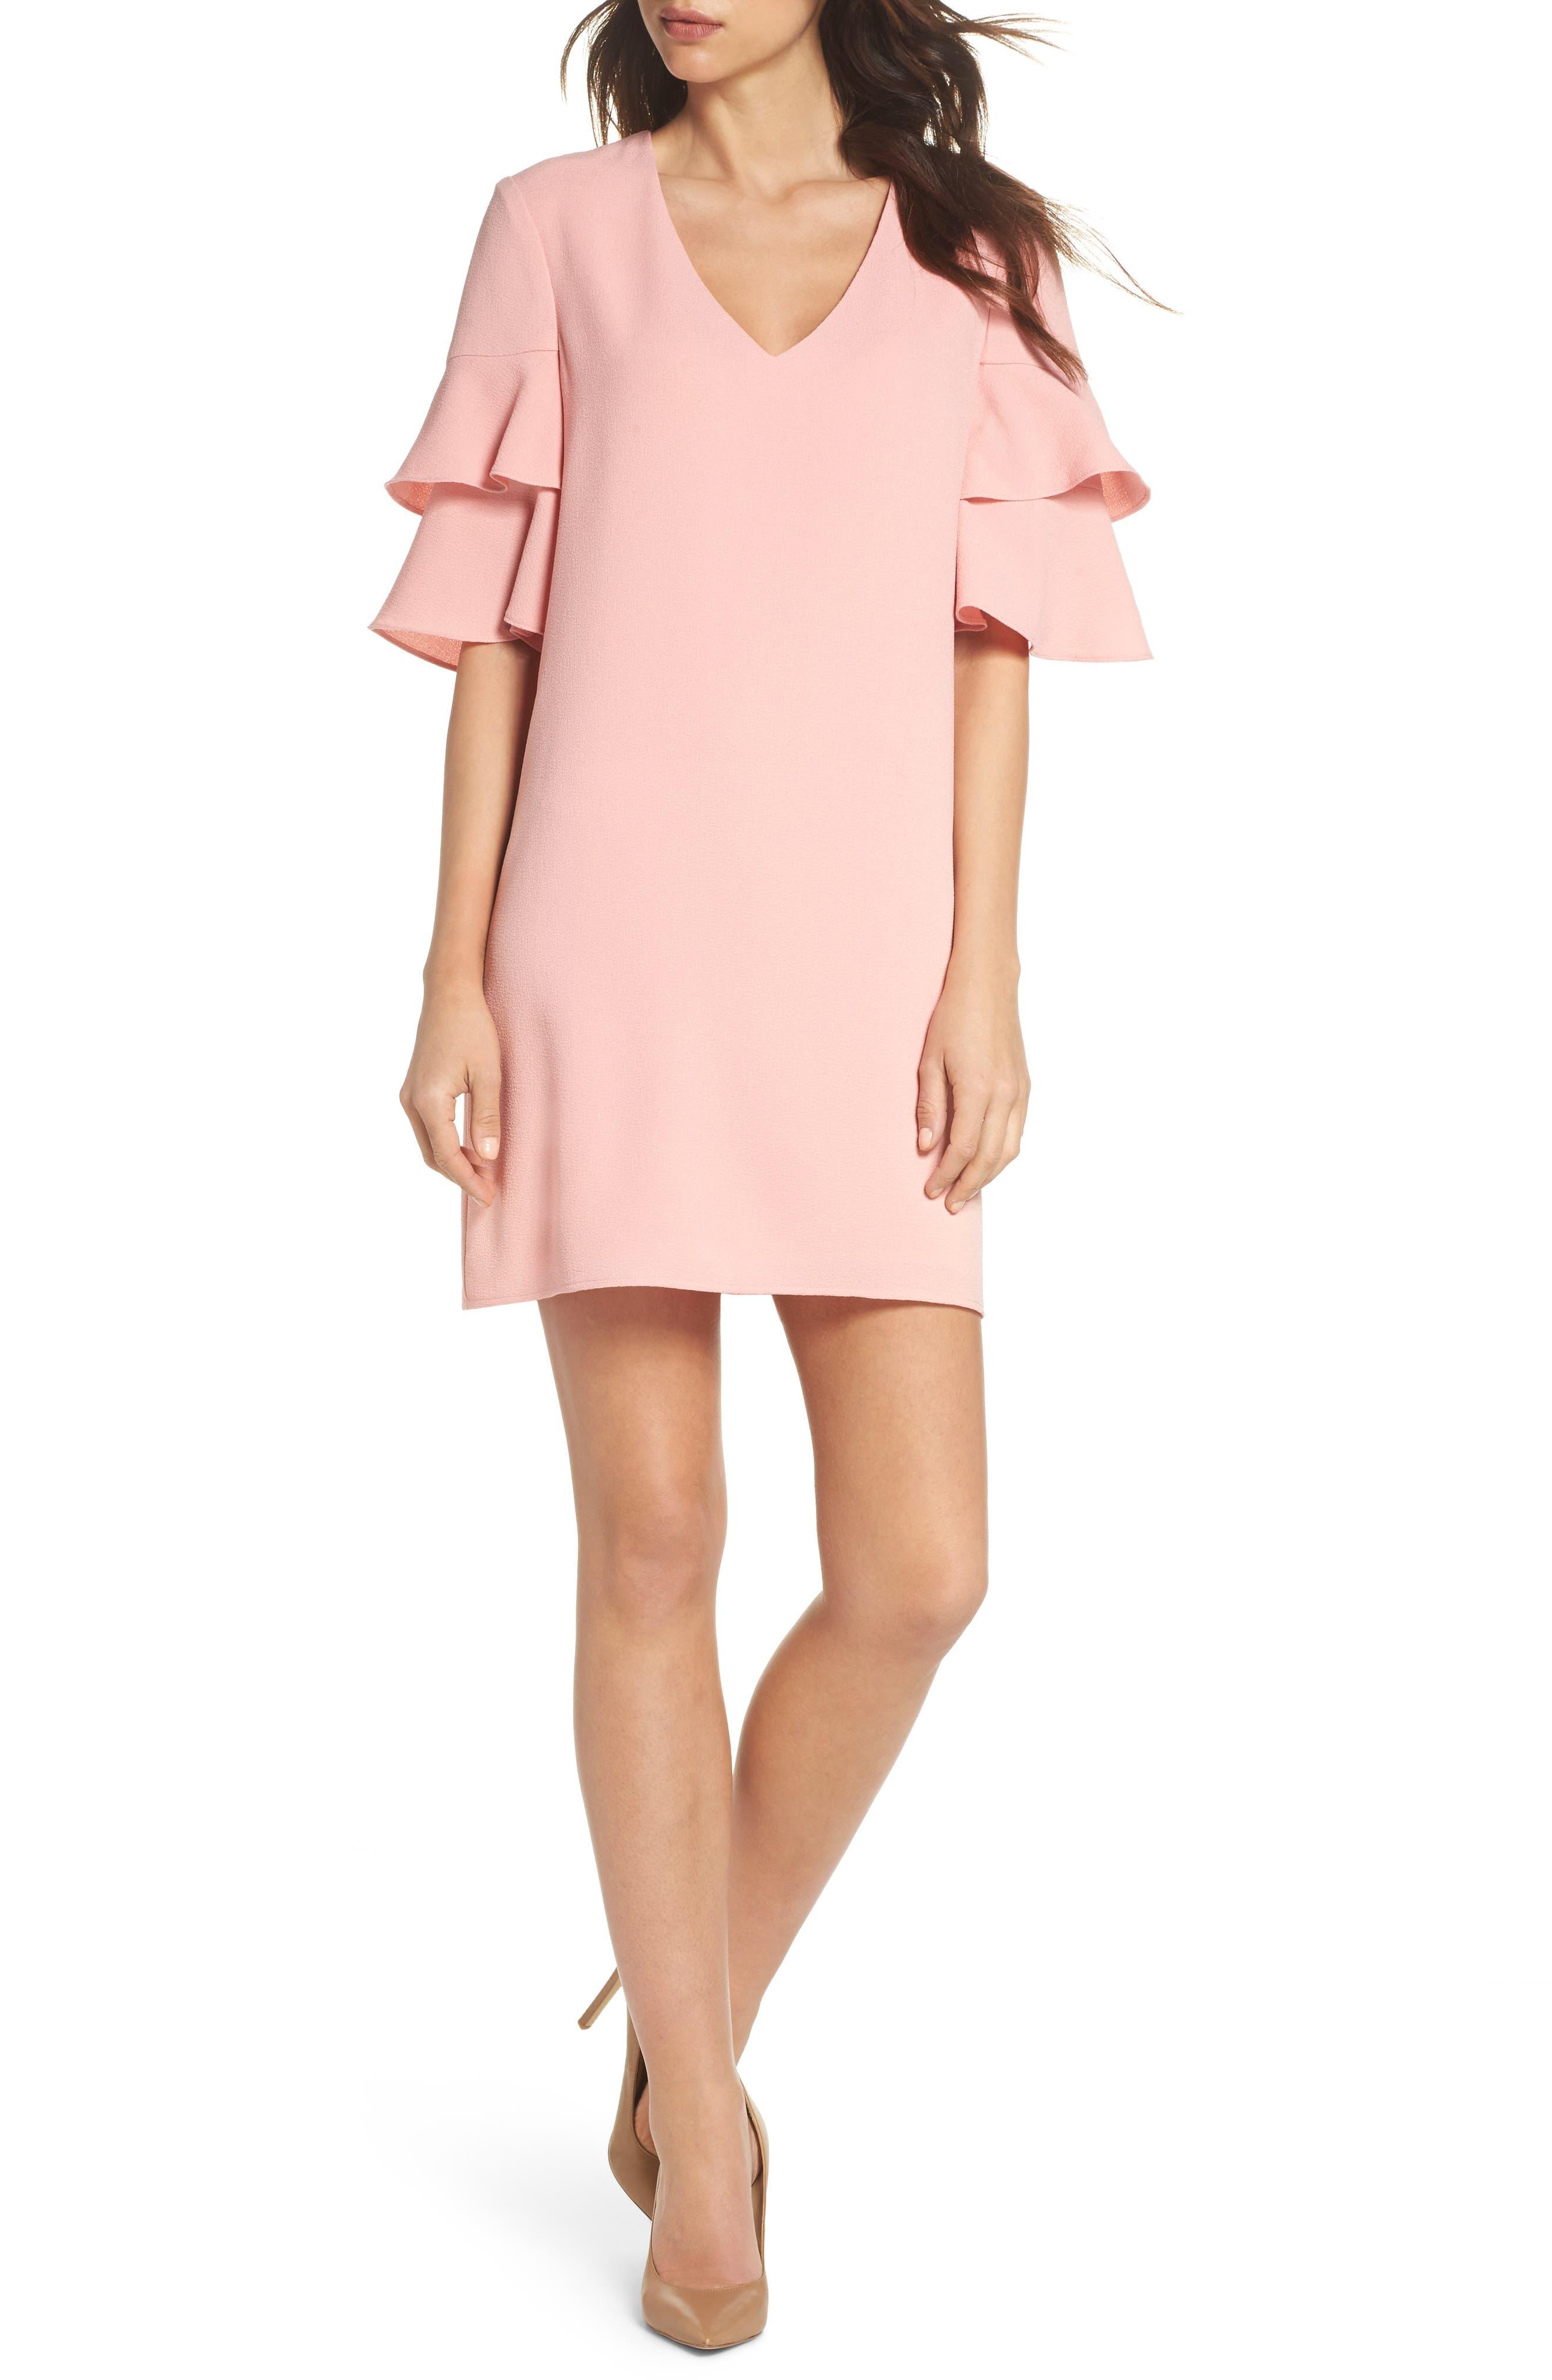 0827a1b80b77 CHARLES HENRY RUFFLE SLEEVE SHIFT DRESS, BLUSH ROSE | ModeSens